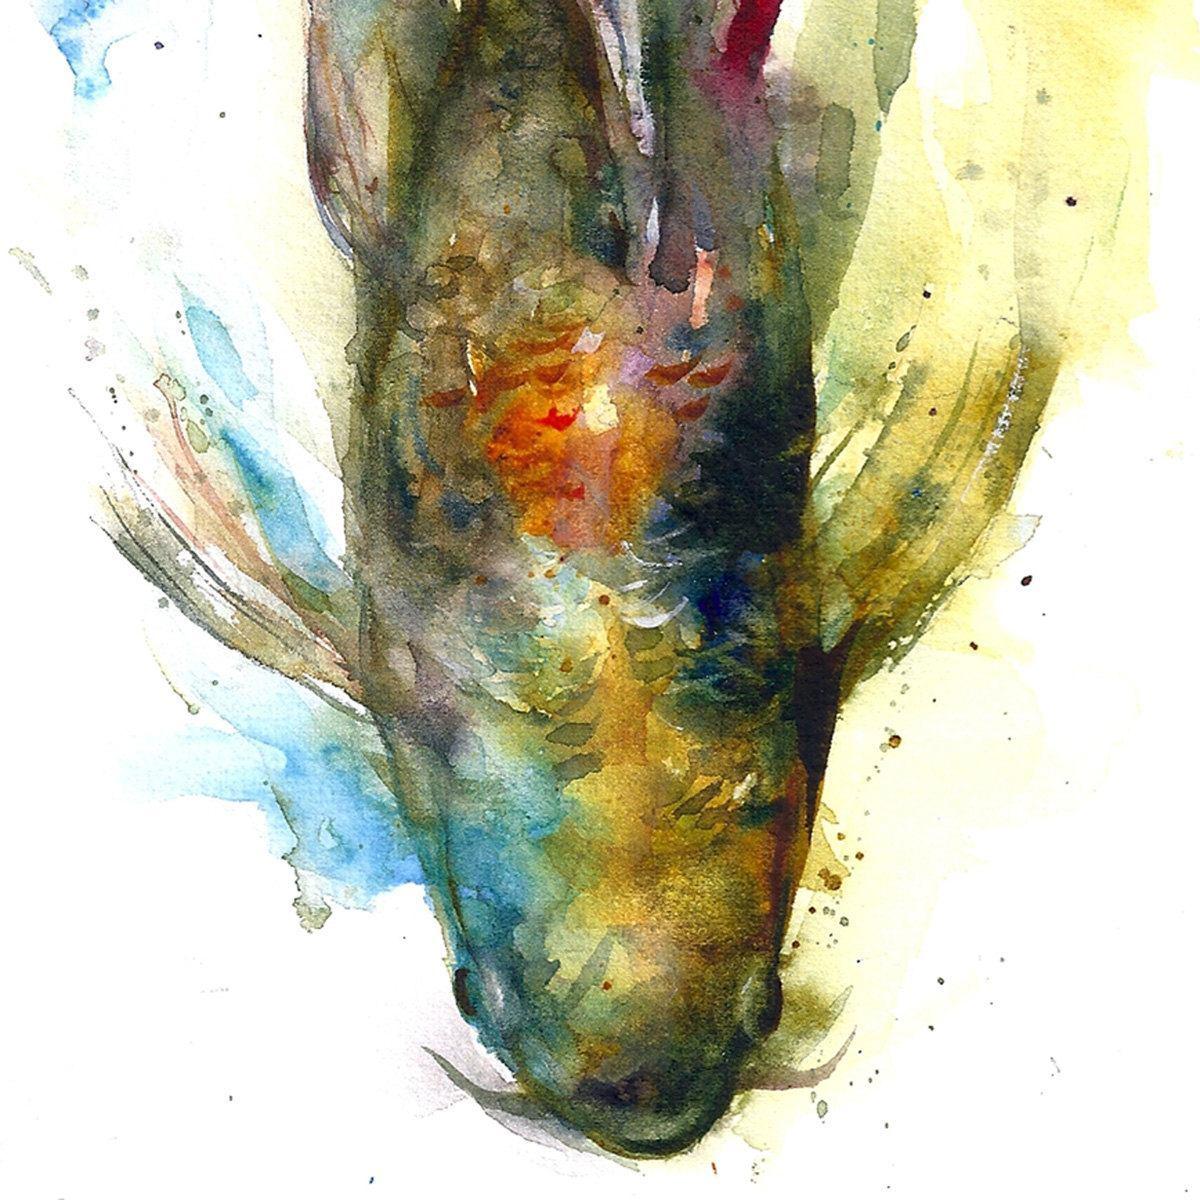 Dean Crouser Paintings a Colorful Dean Crouser